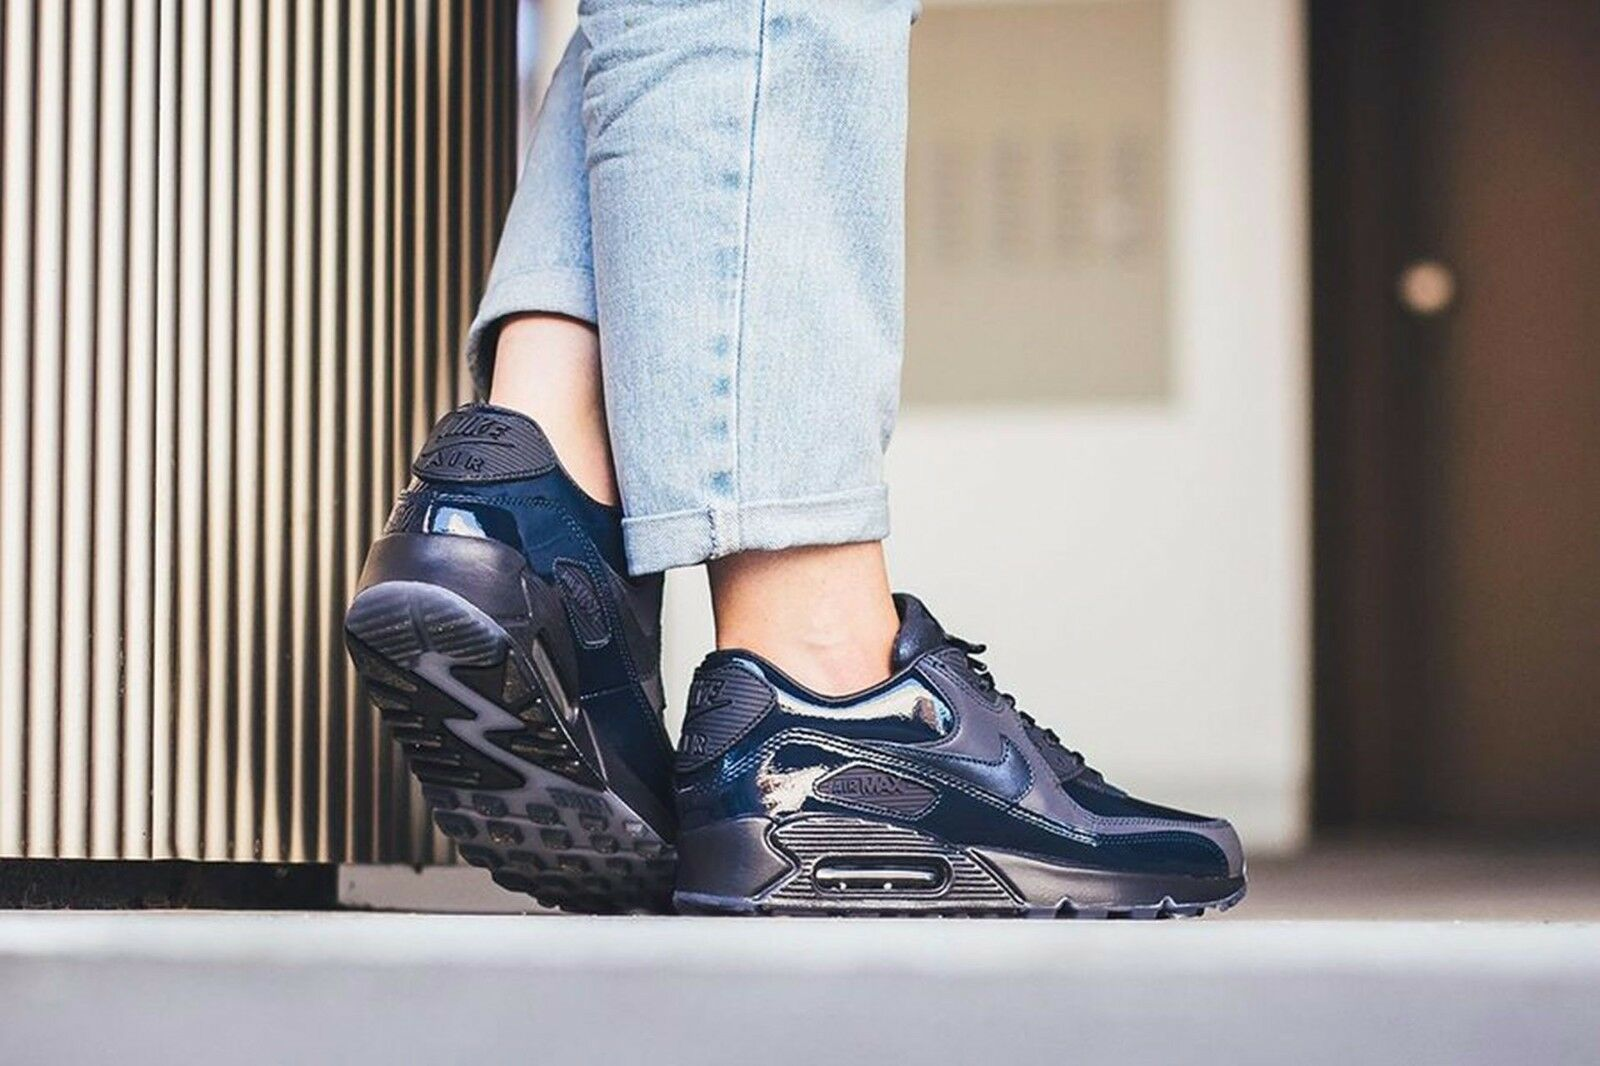 Nike air max 90 pedro louren ç o 867116-400 obsidian obsidian obsidian wmn sz 5,5 149b8e